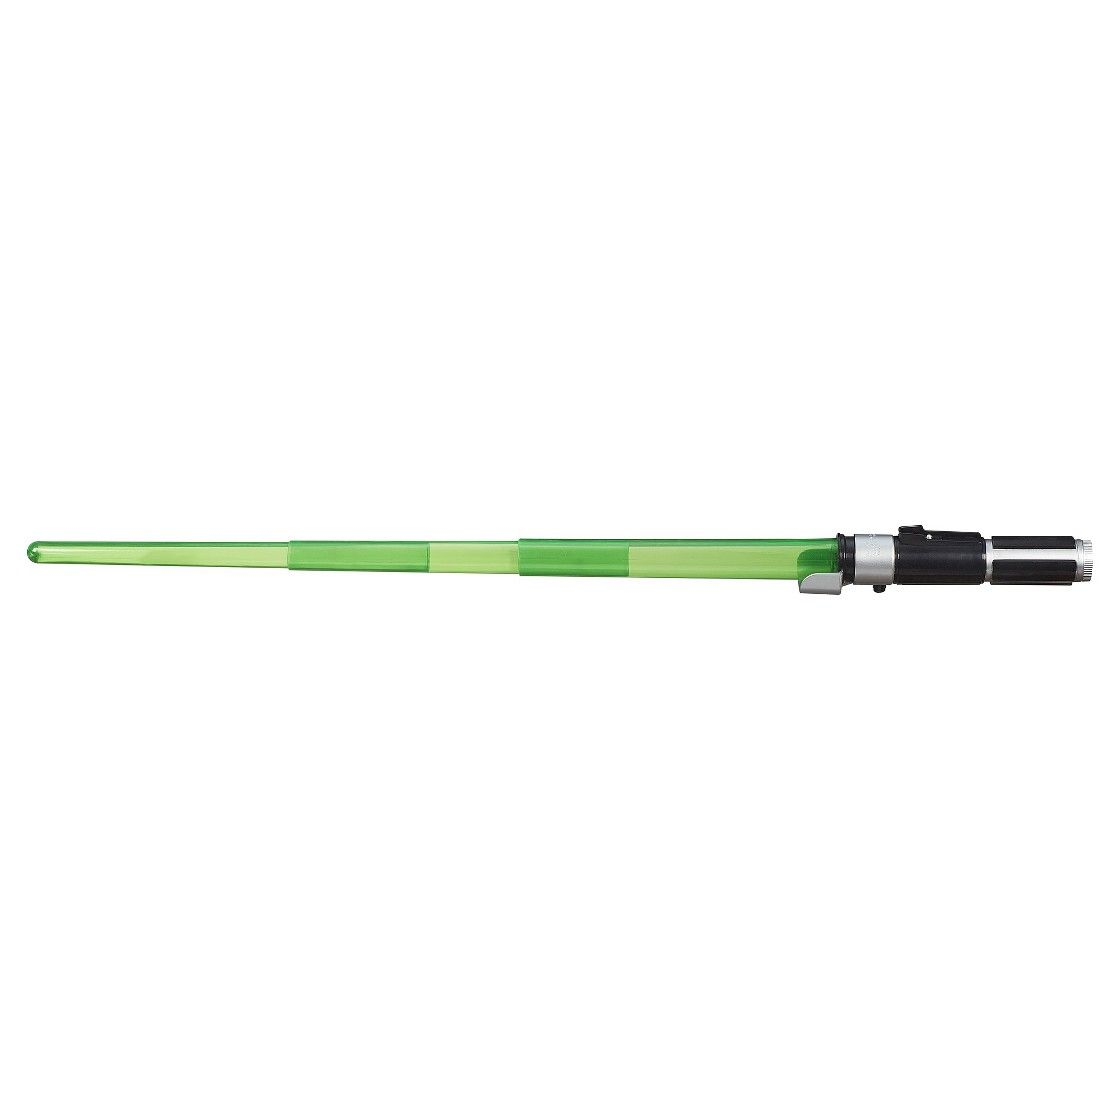 Star Wars Yoda Electronic Lightsaber Toy